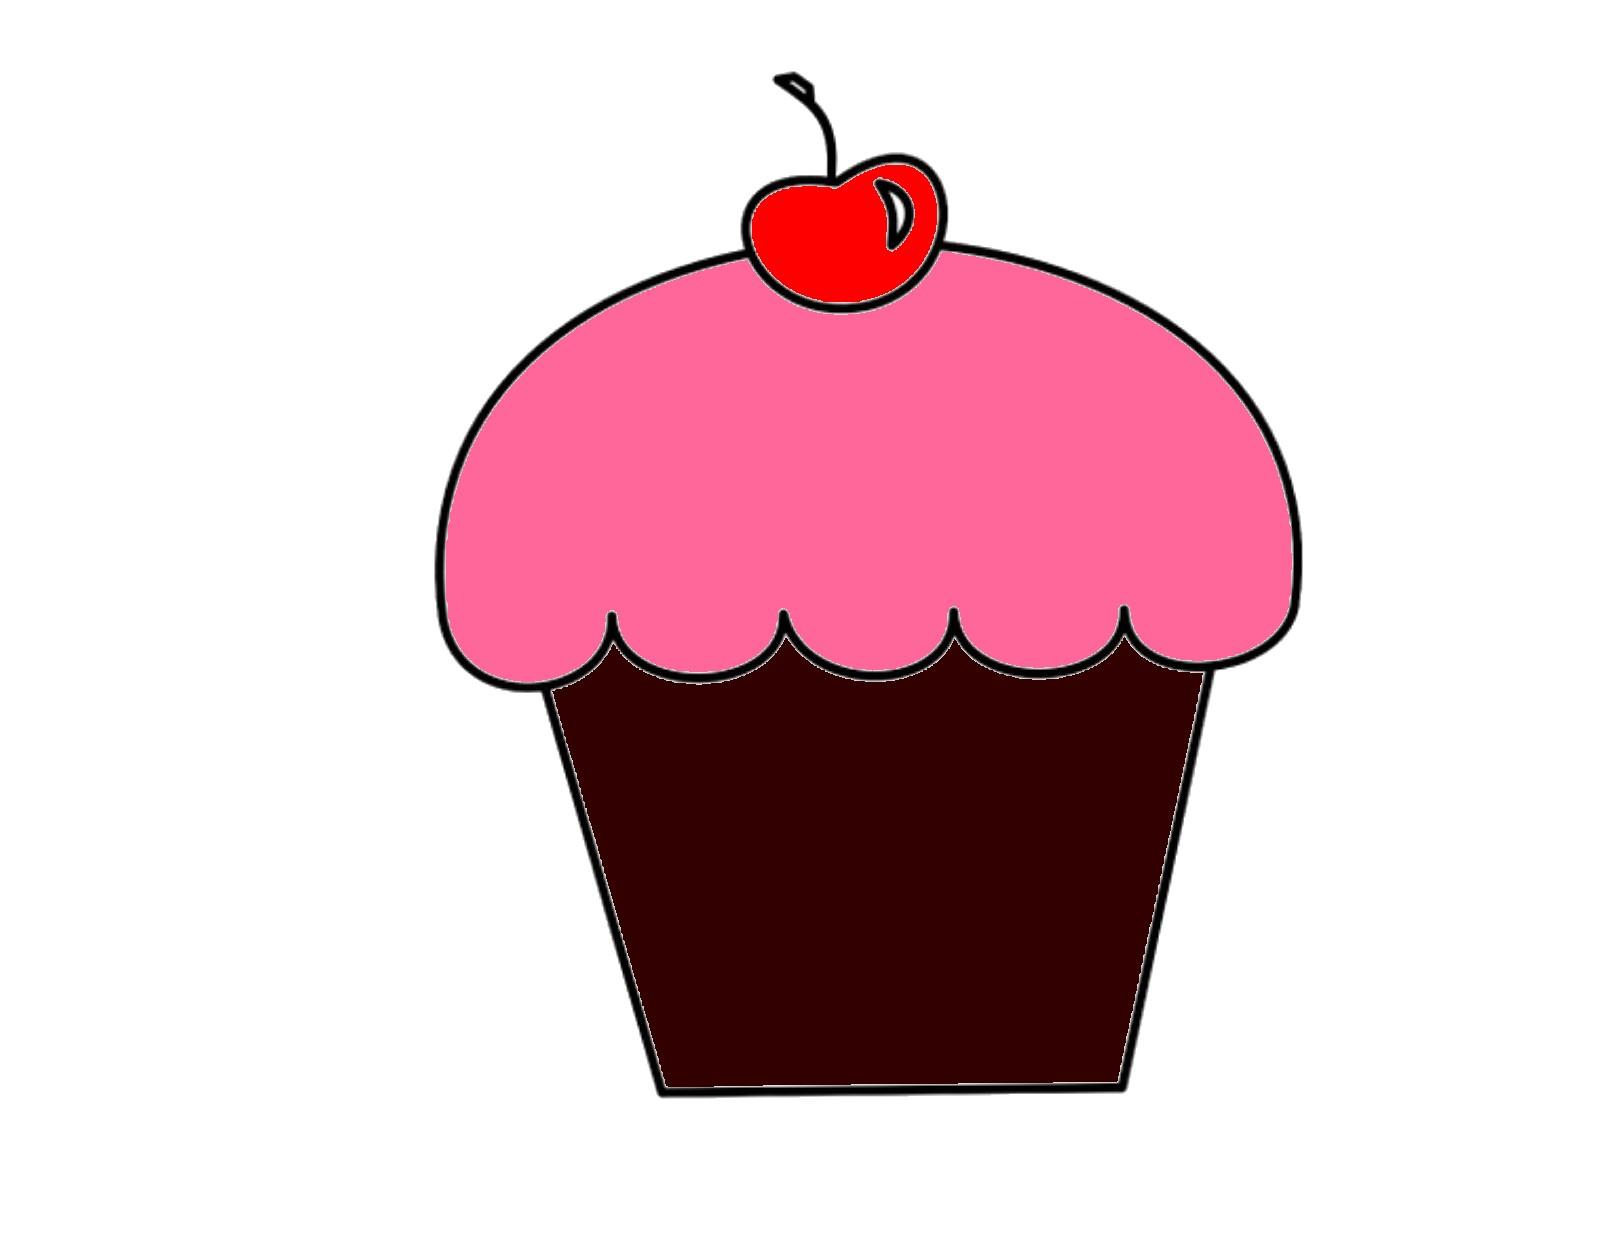 Cupcake image - vector clip art online, royalty free & public domain